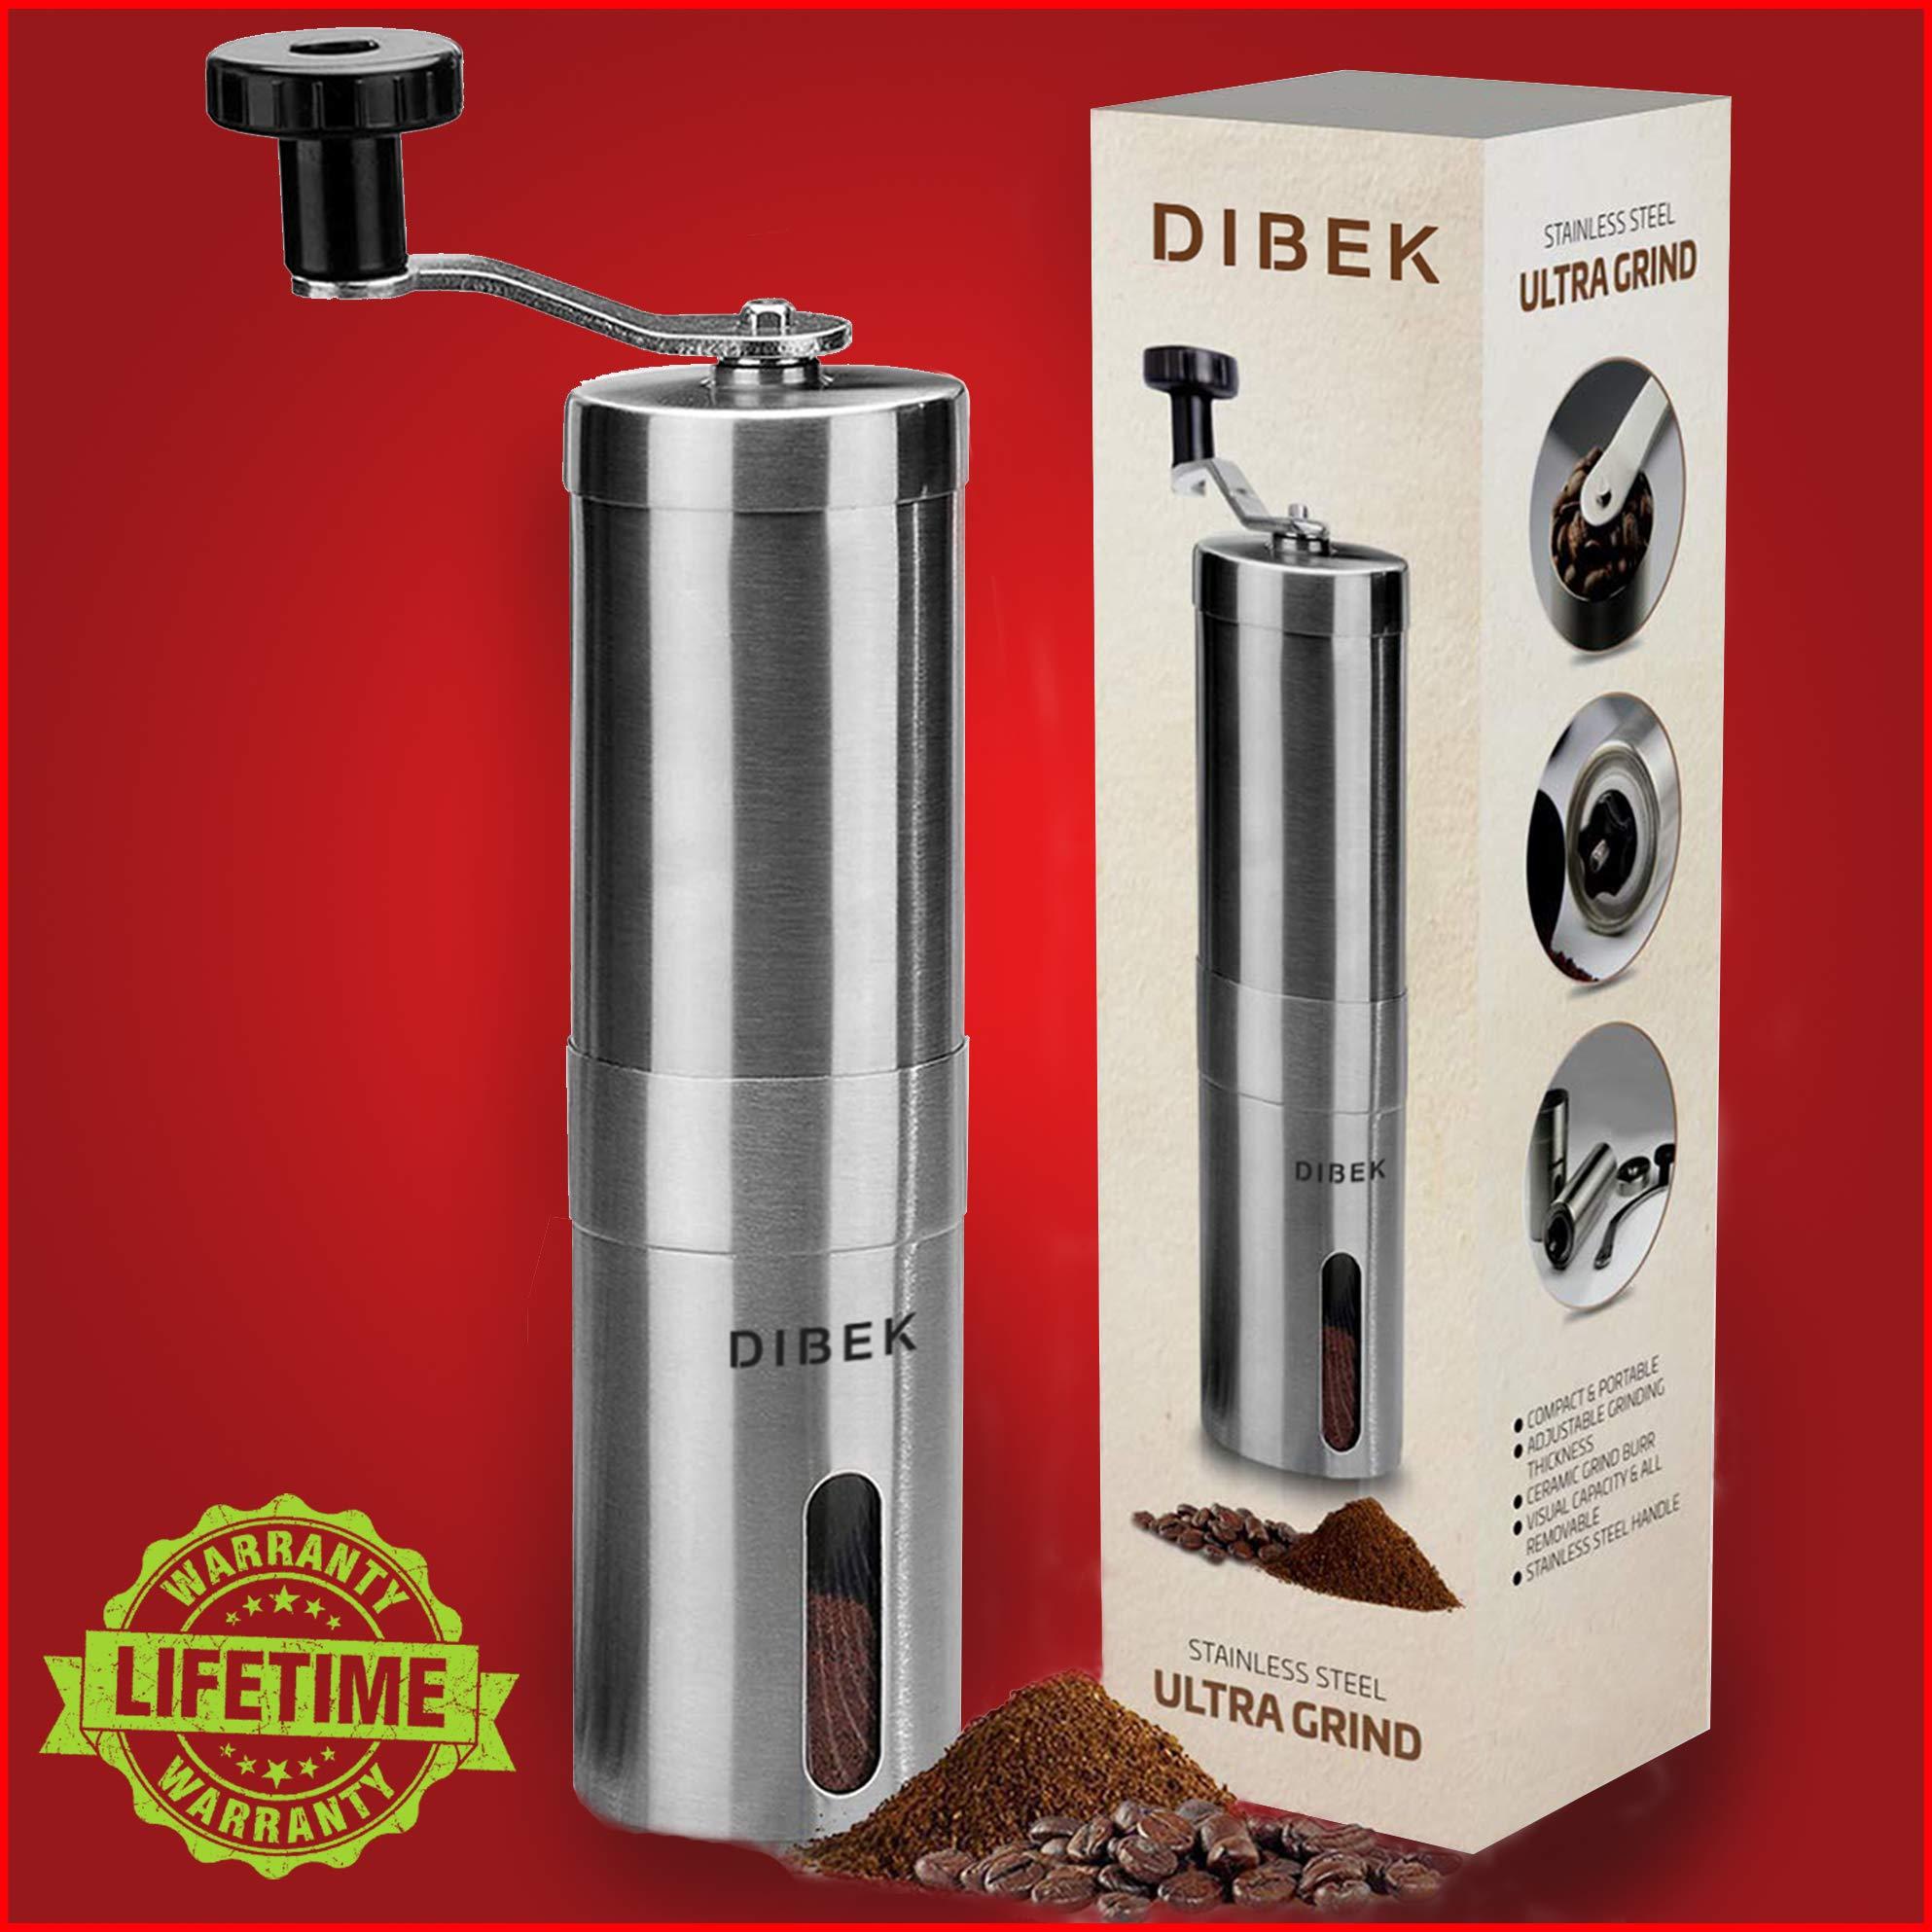 DIBEK UPGRADED VERSION Manual Coffee Grinder, Conical Burr Mill, Brushed Stainless Steel - Lifetime Warranty